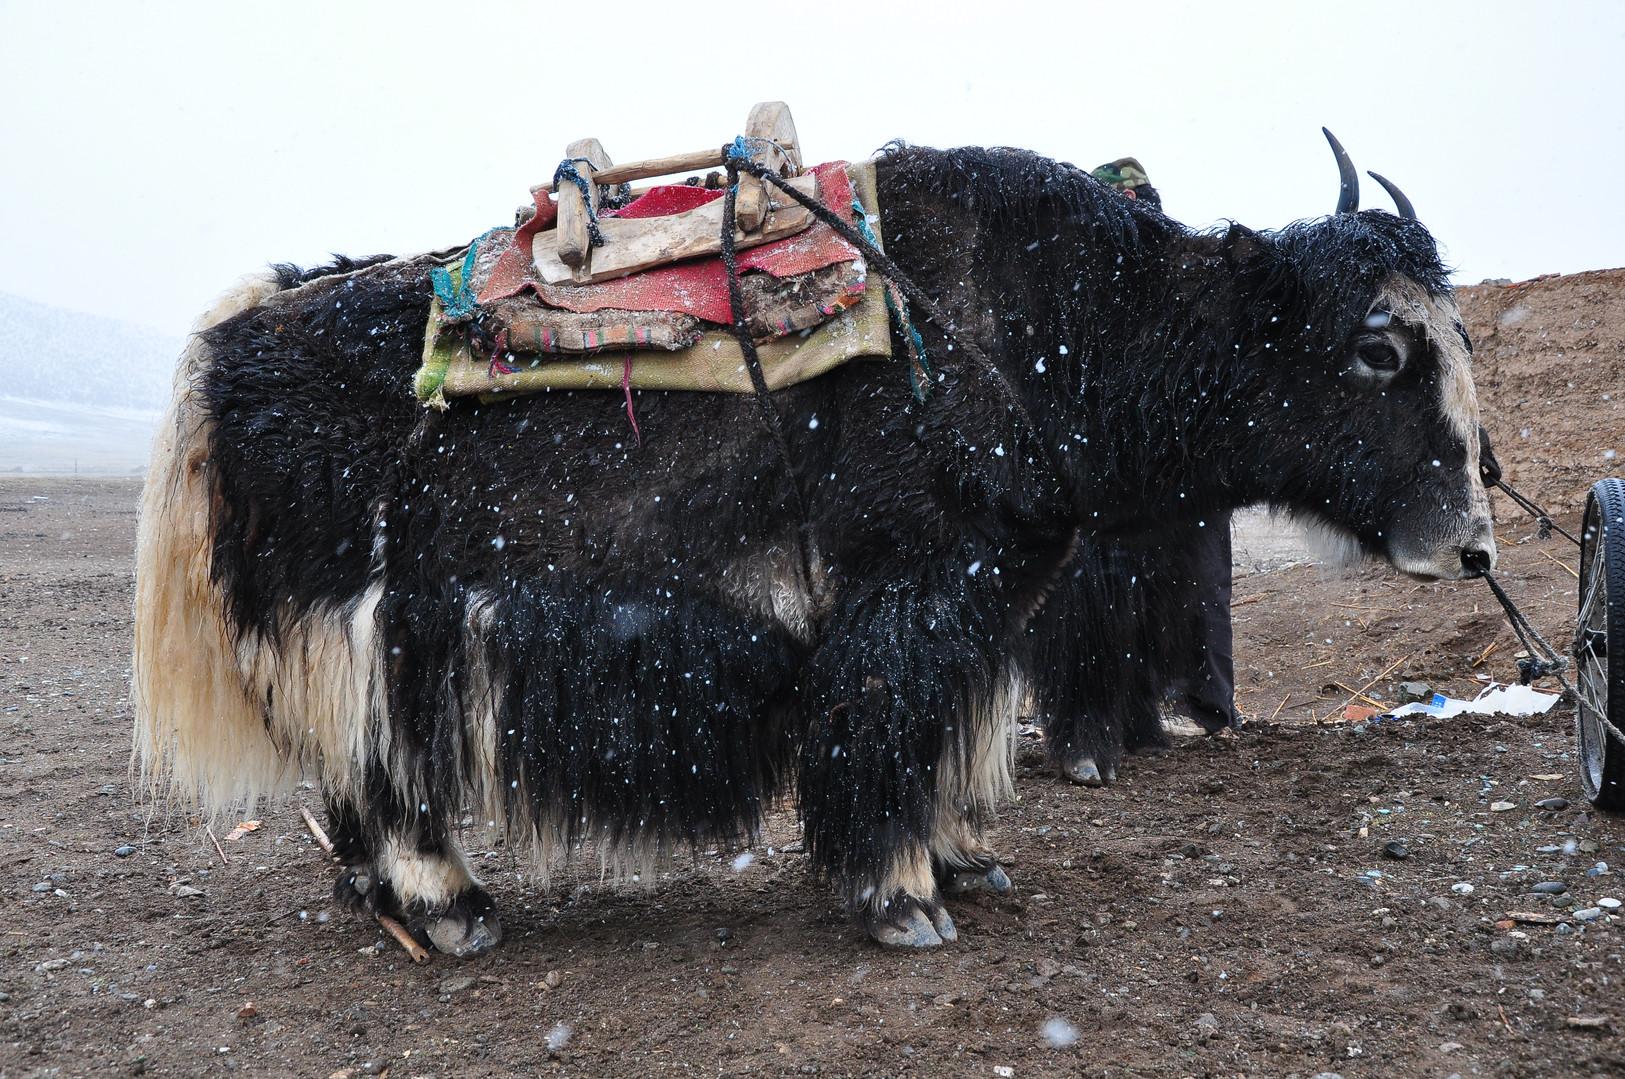 Transporter - Amne Machin, Qinghai